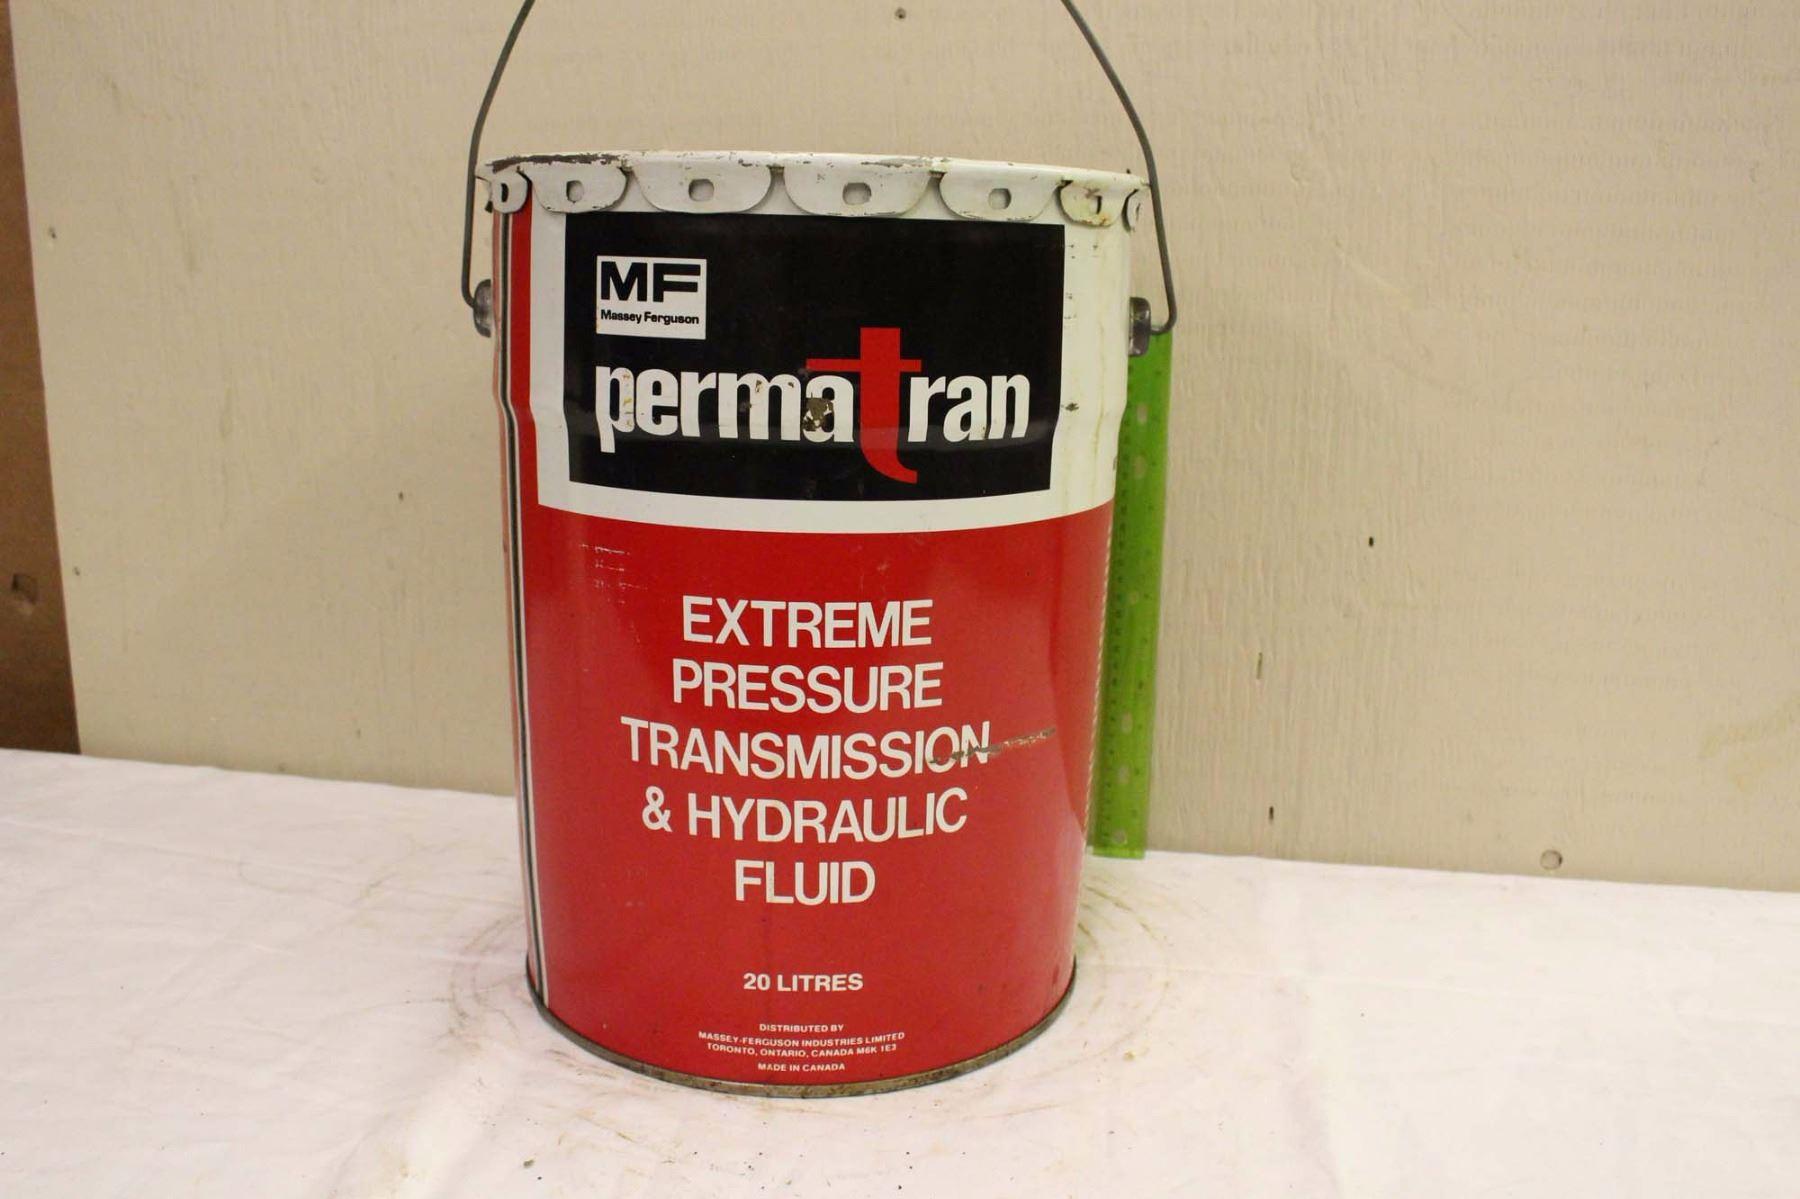 MF Perma Tran Extreme Pressure Transmission& Hydraulic Fluid Pail  (20Ltrs)(Emptied)